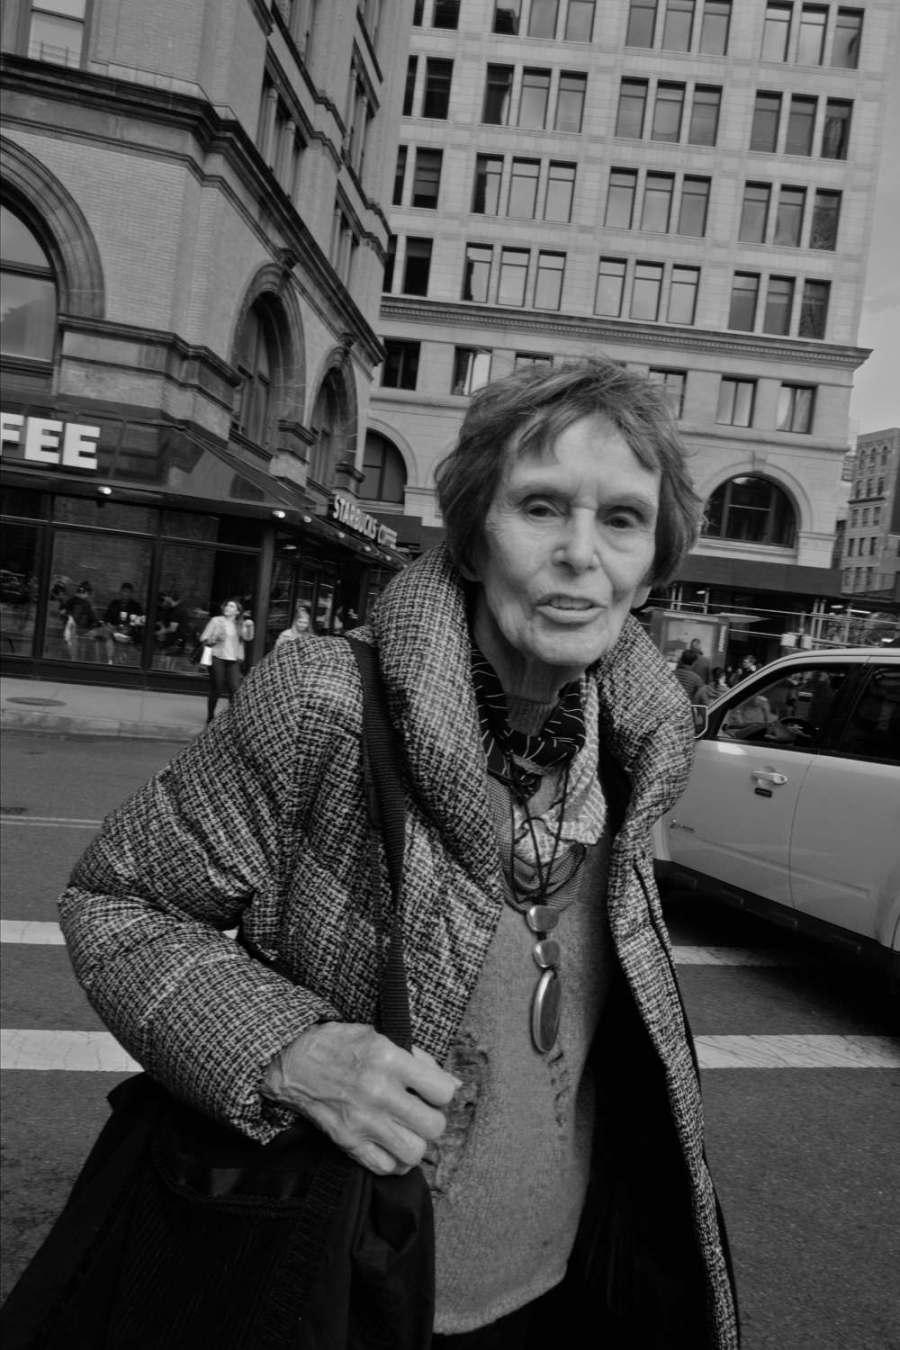 East Village Woman-Exposure